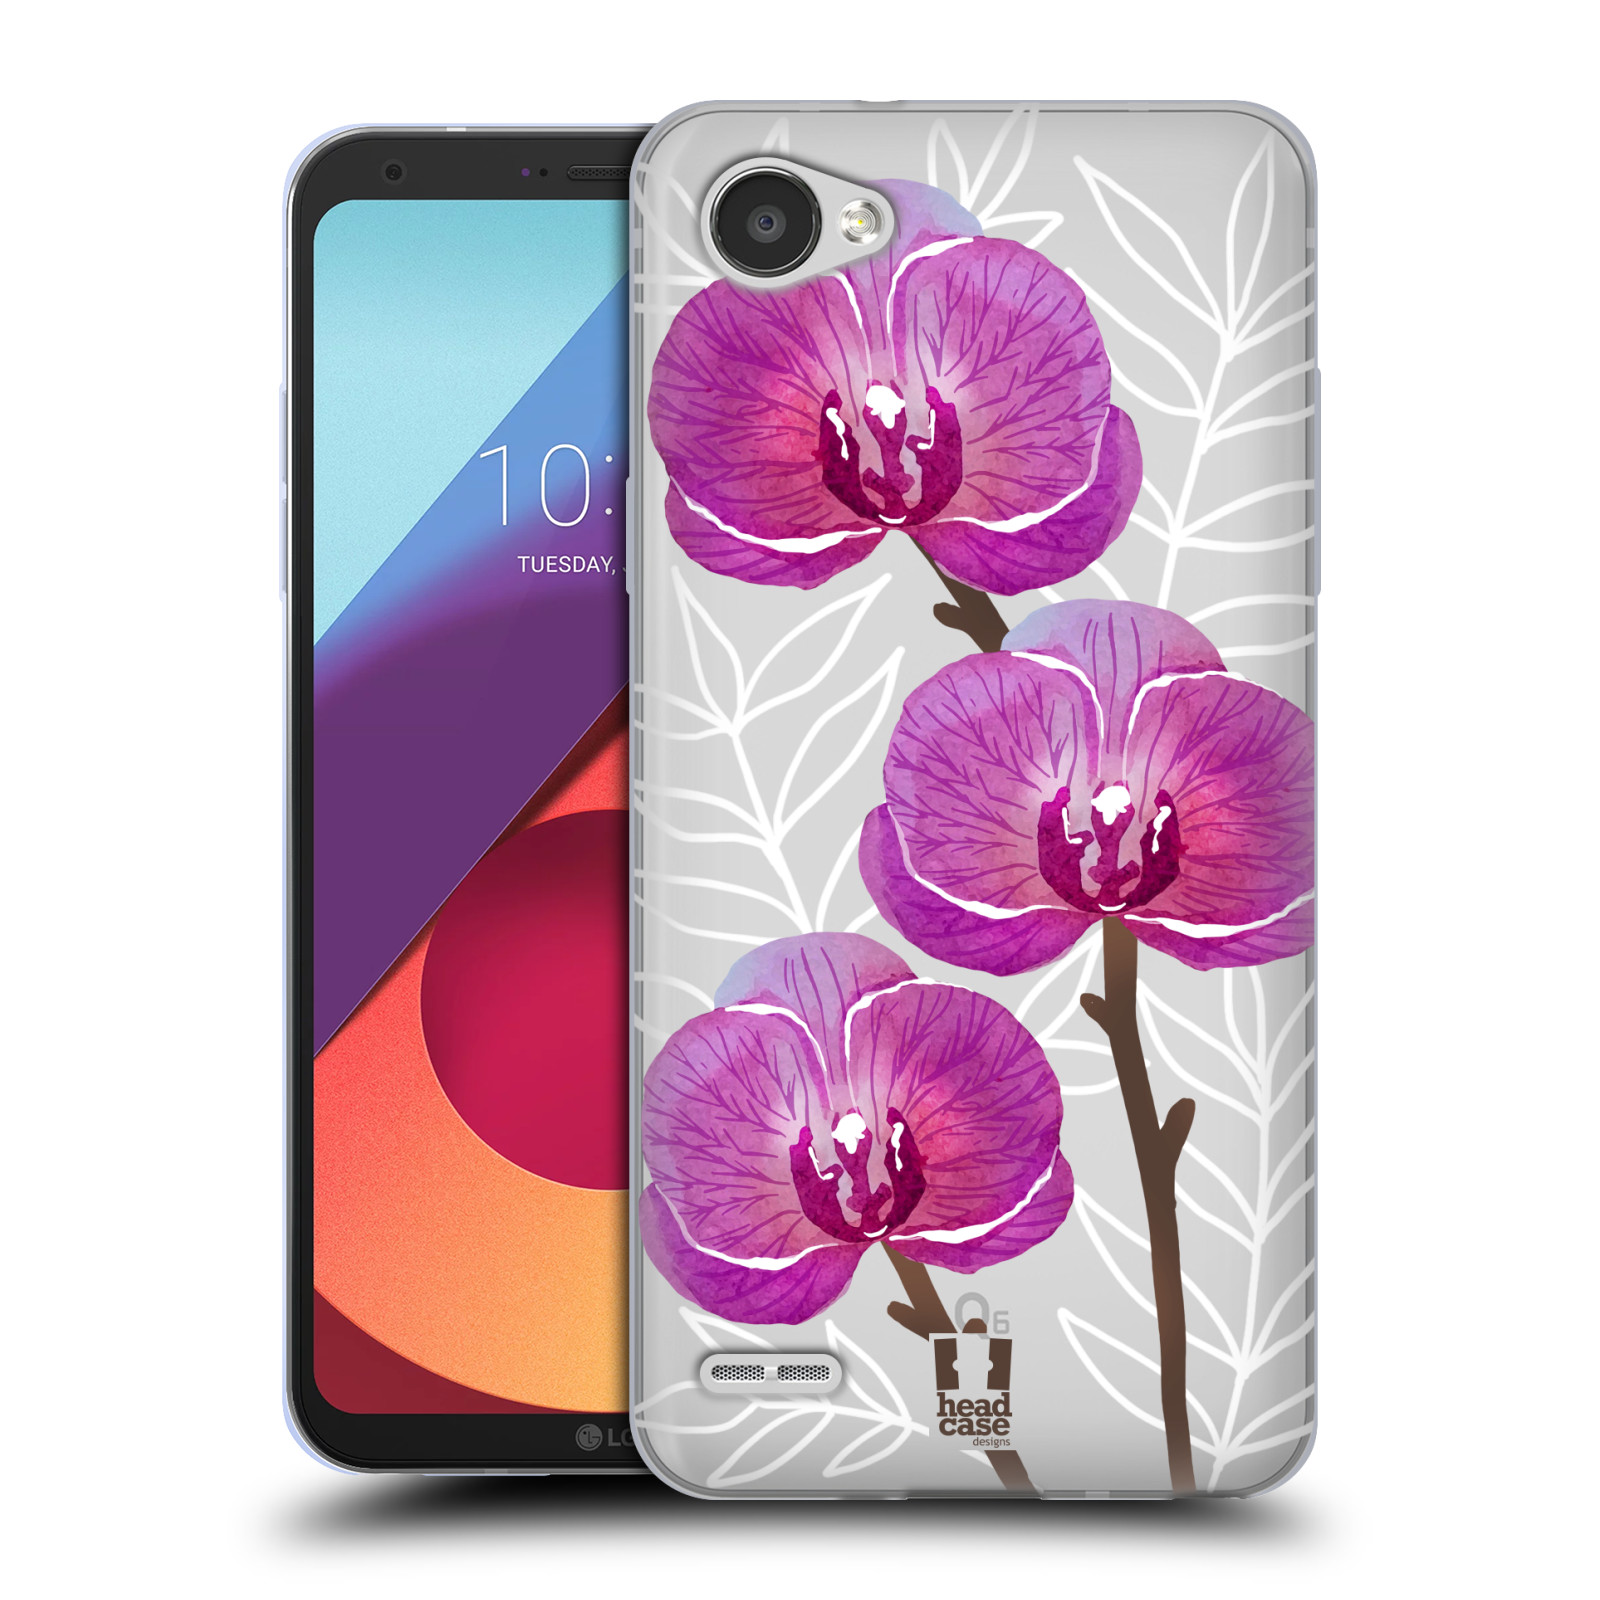 Silikonové pouzdro na mobil LG Q6 - Head Case - Hezoučké kvítky - průhledné